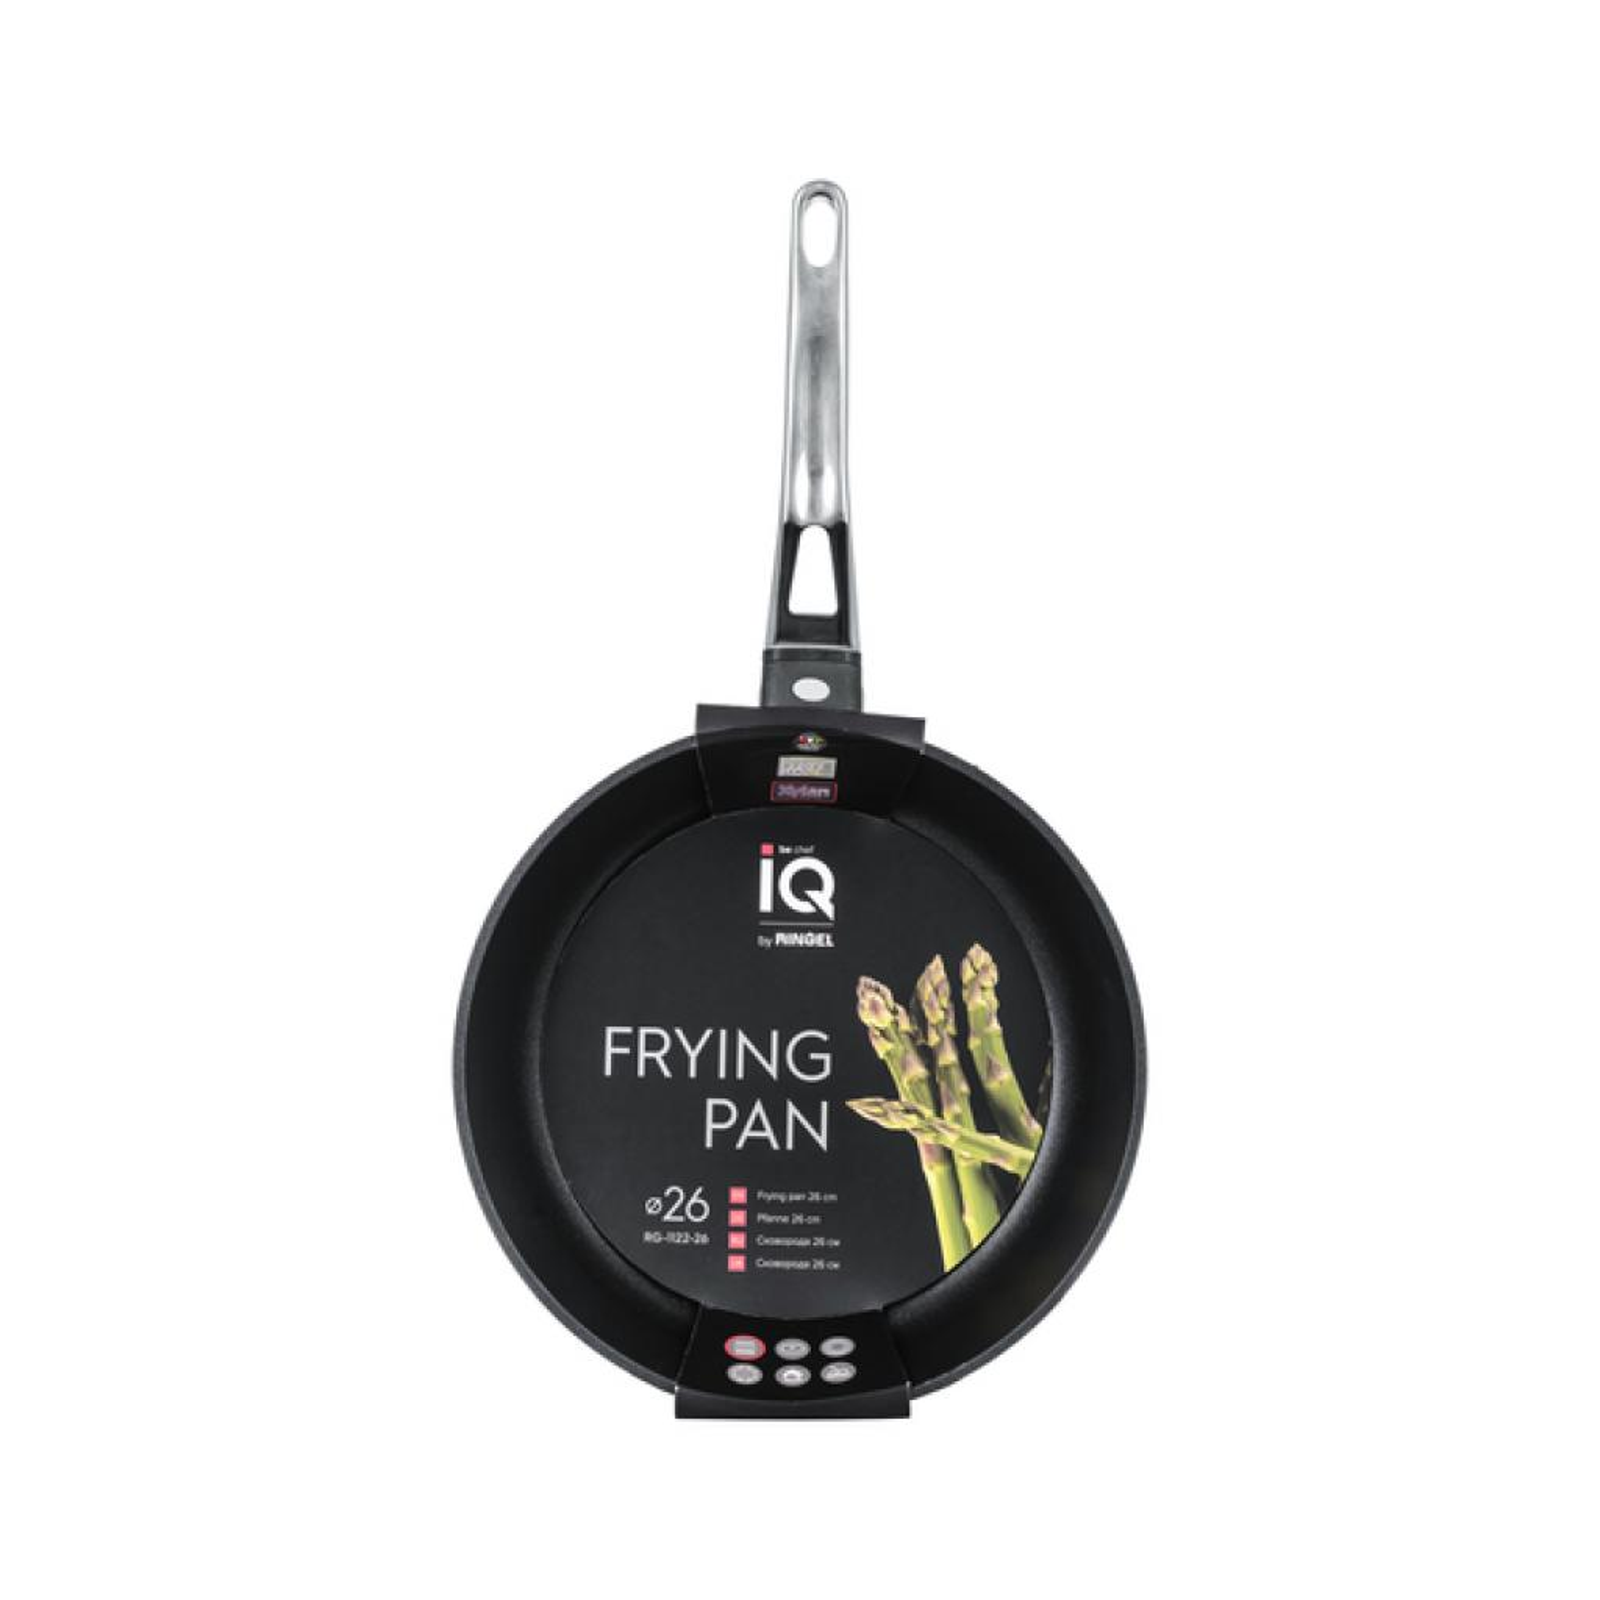 Сковорода Ringel IQ Be Chef 28 см (RG-1126-28) изображение 5